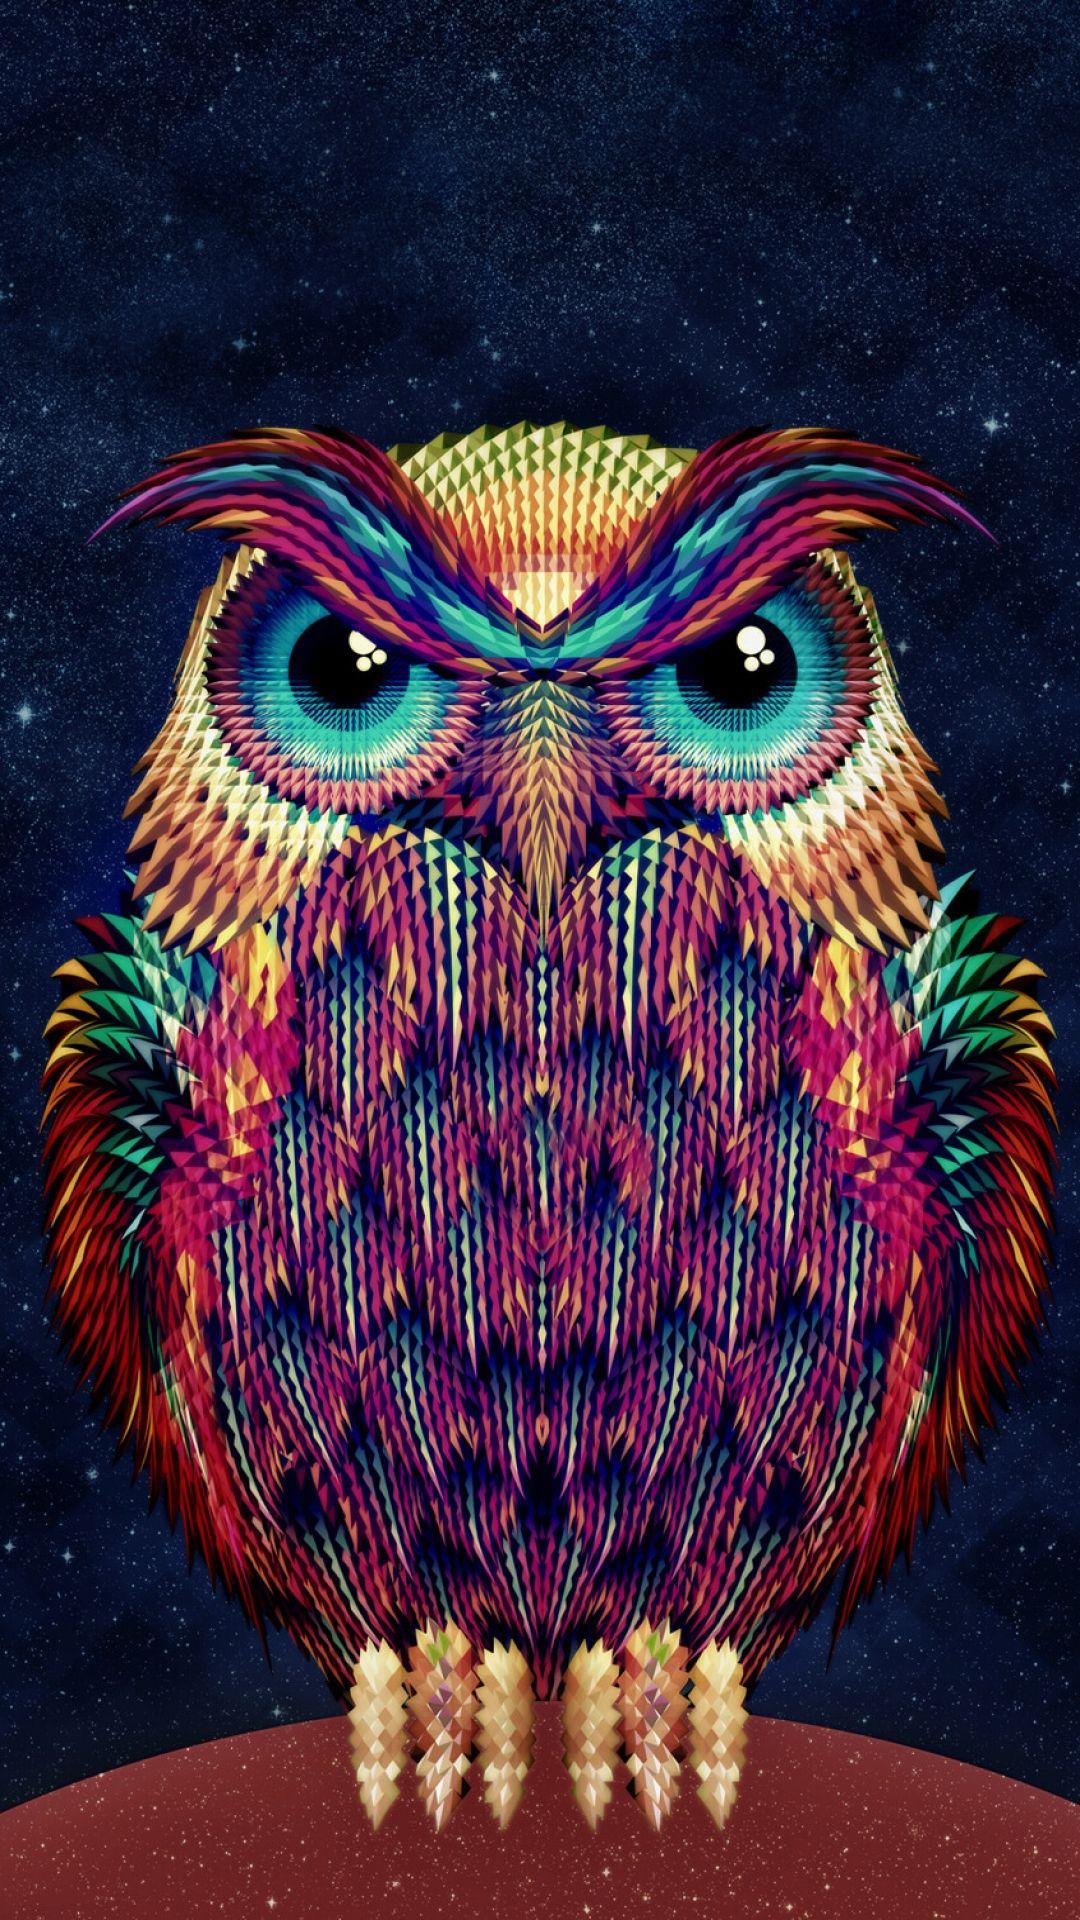 Owl Hd Wallpaper Android owl hd Wallpaper Android Hd